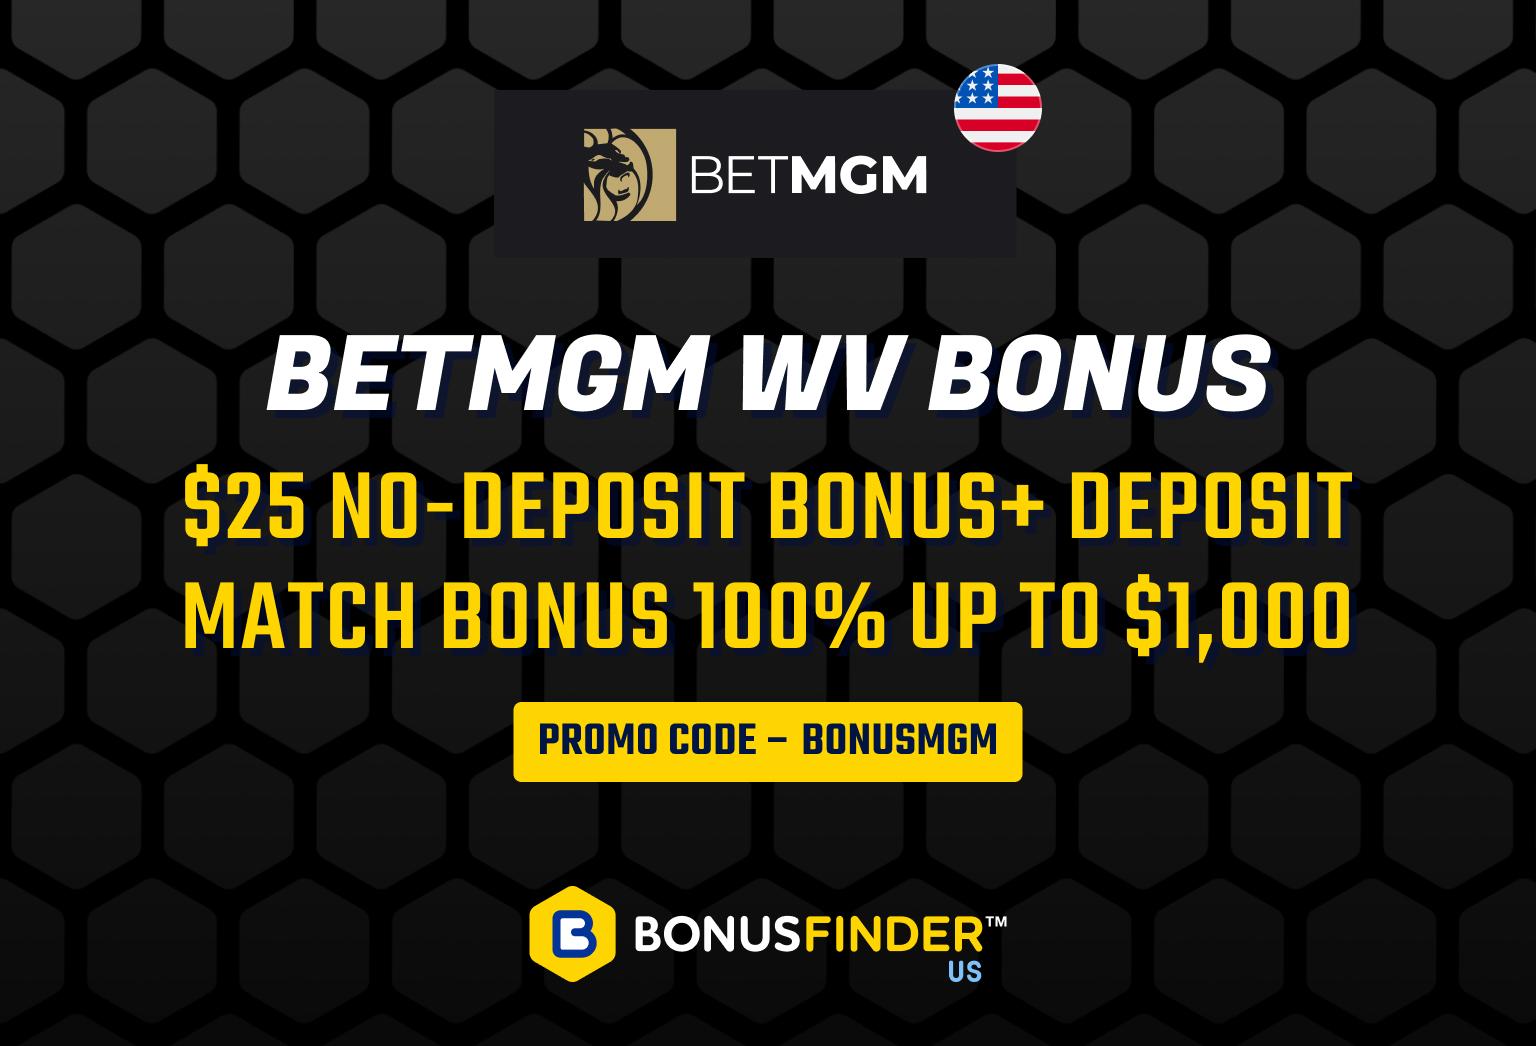 BetMGM Casino and Sportsbook WV promocode and sign up bonus